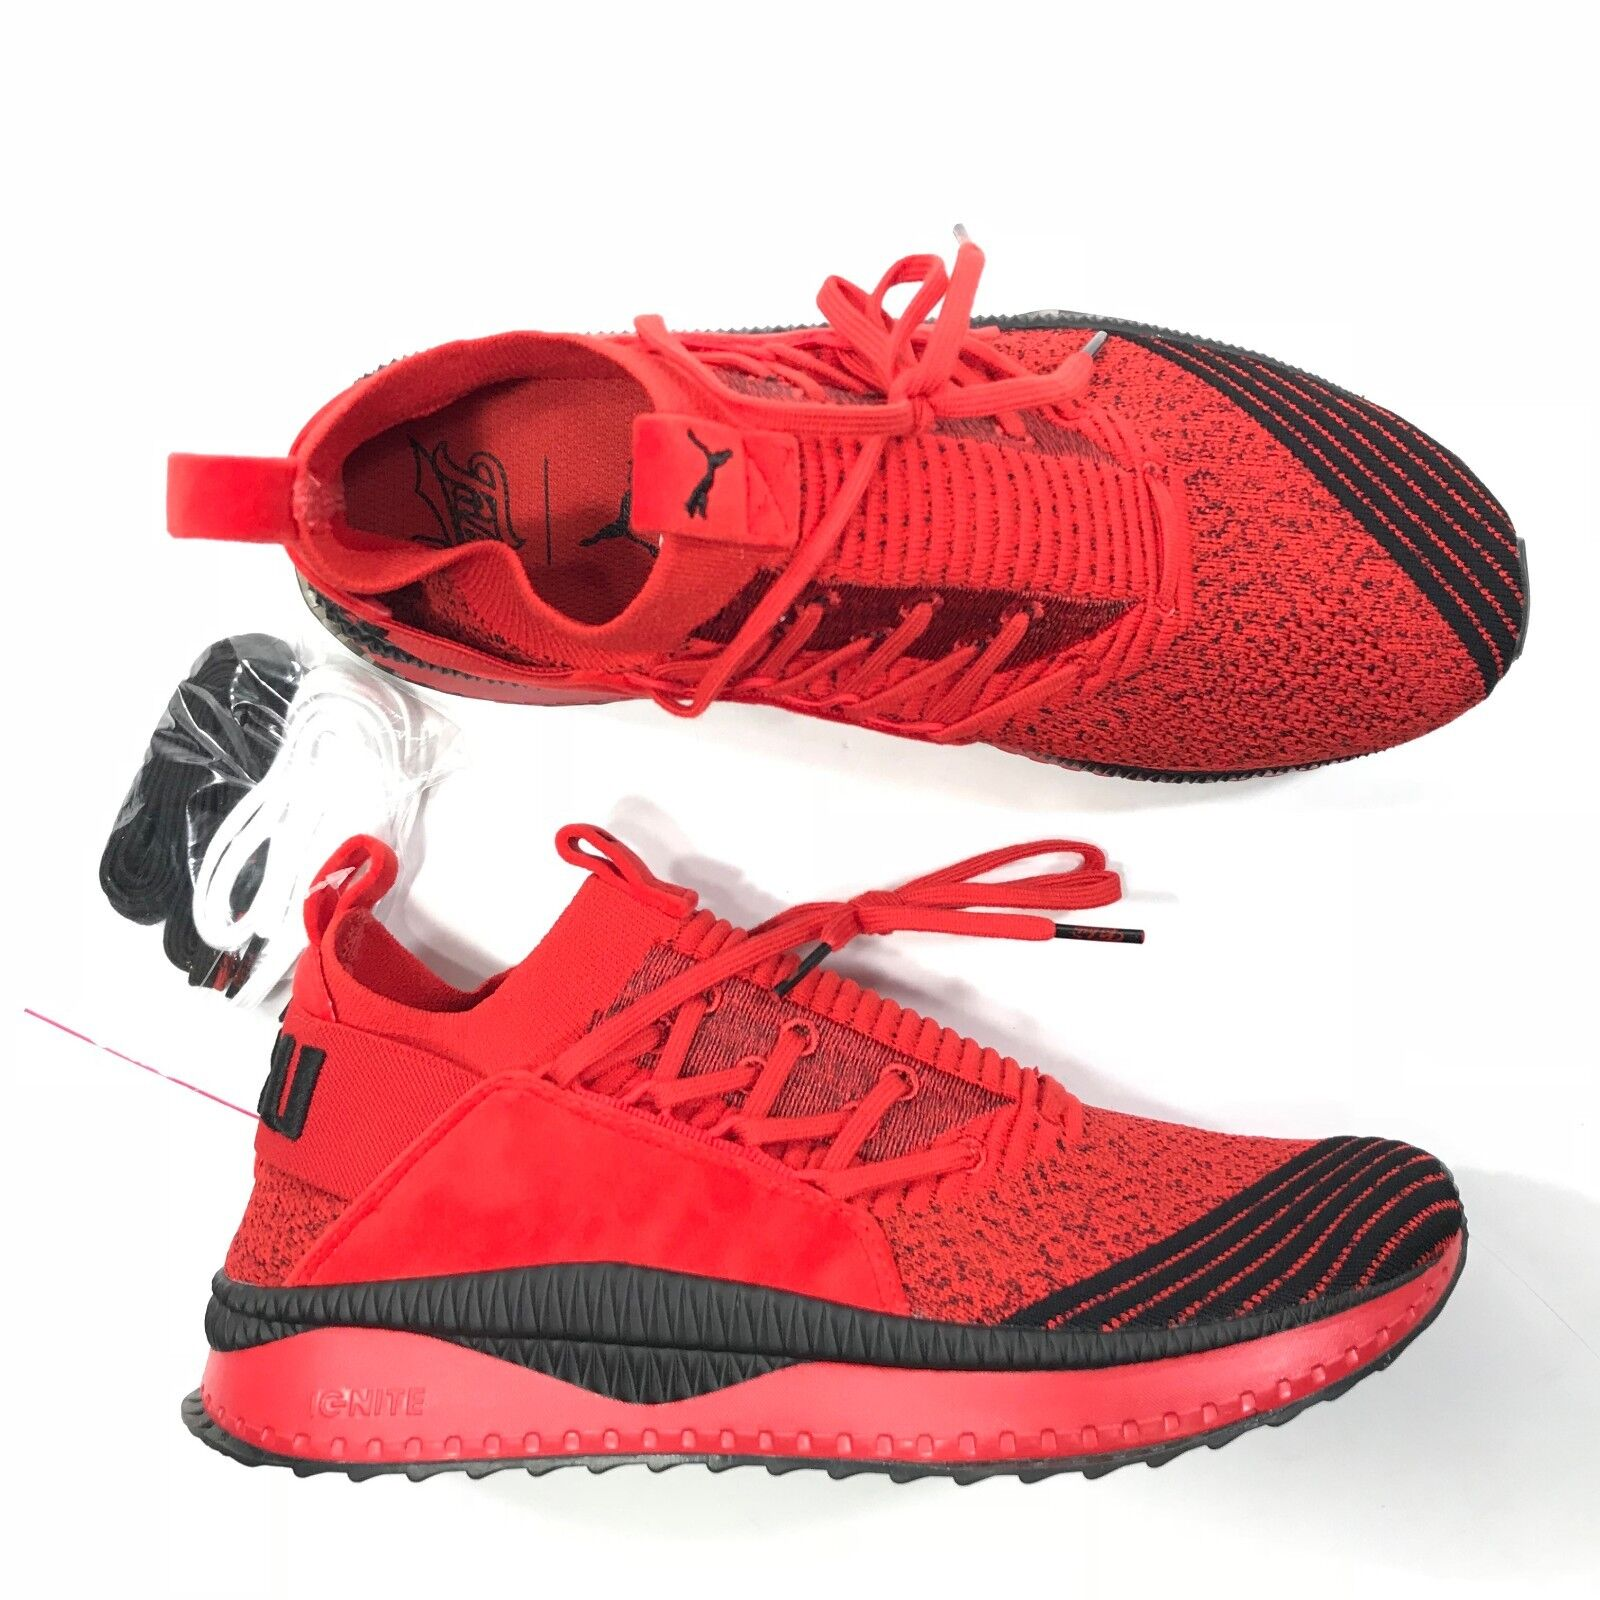 Puma x Fubu Mens Tsugi Sneakers W0119